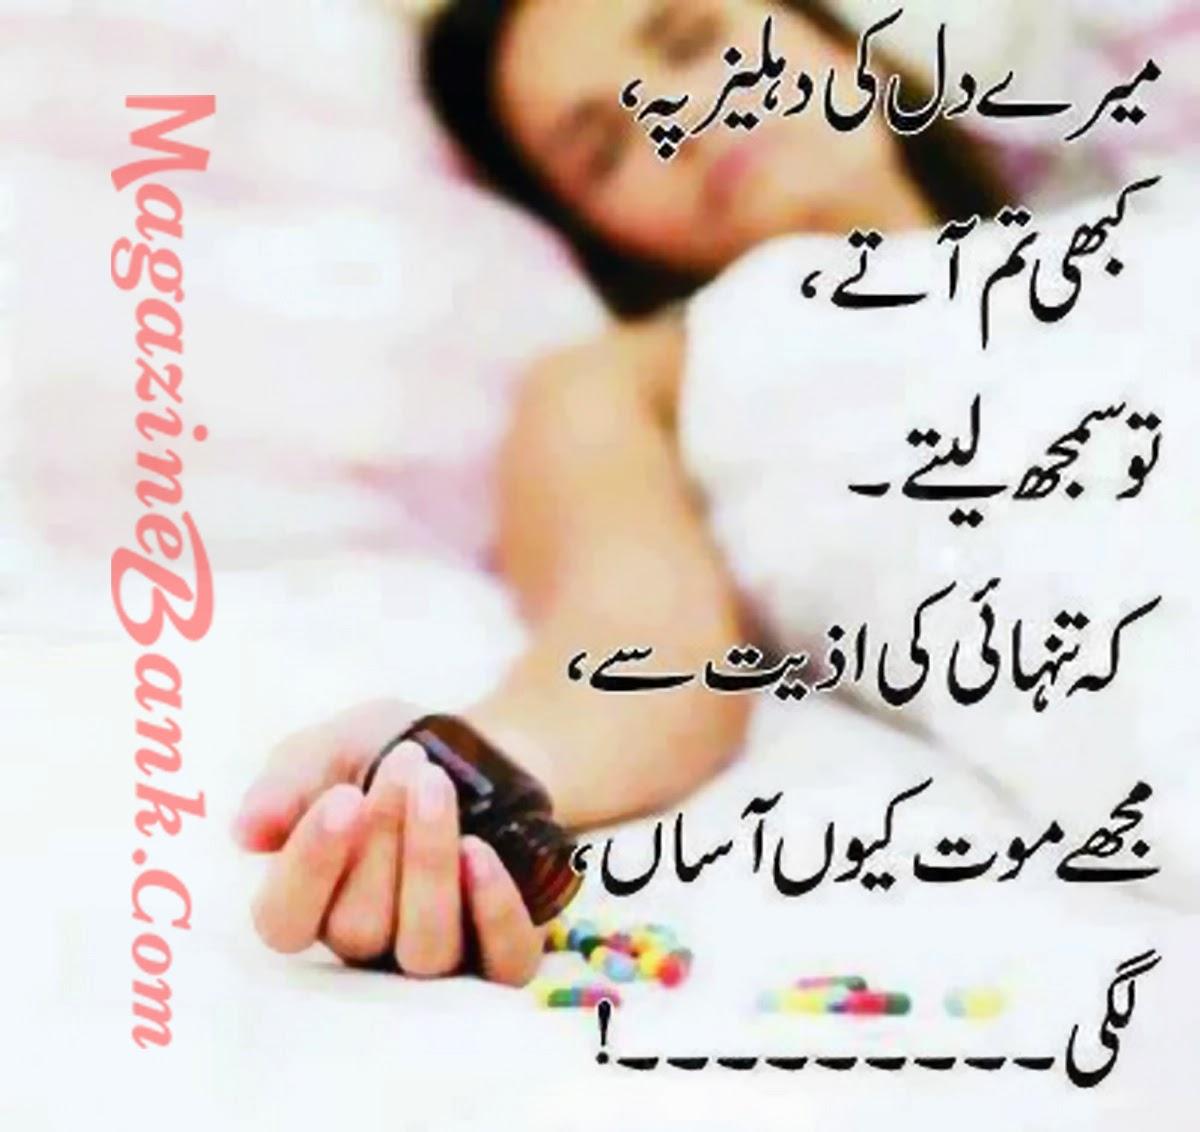 ... 126kB, New Year Sad Poetry Urdu Images | New Calendar Template Site